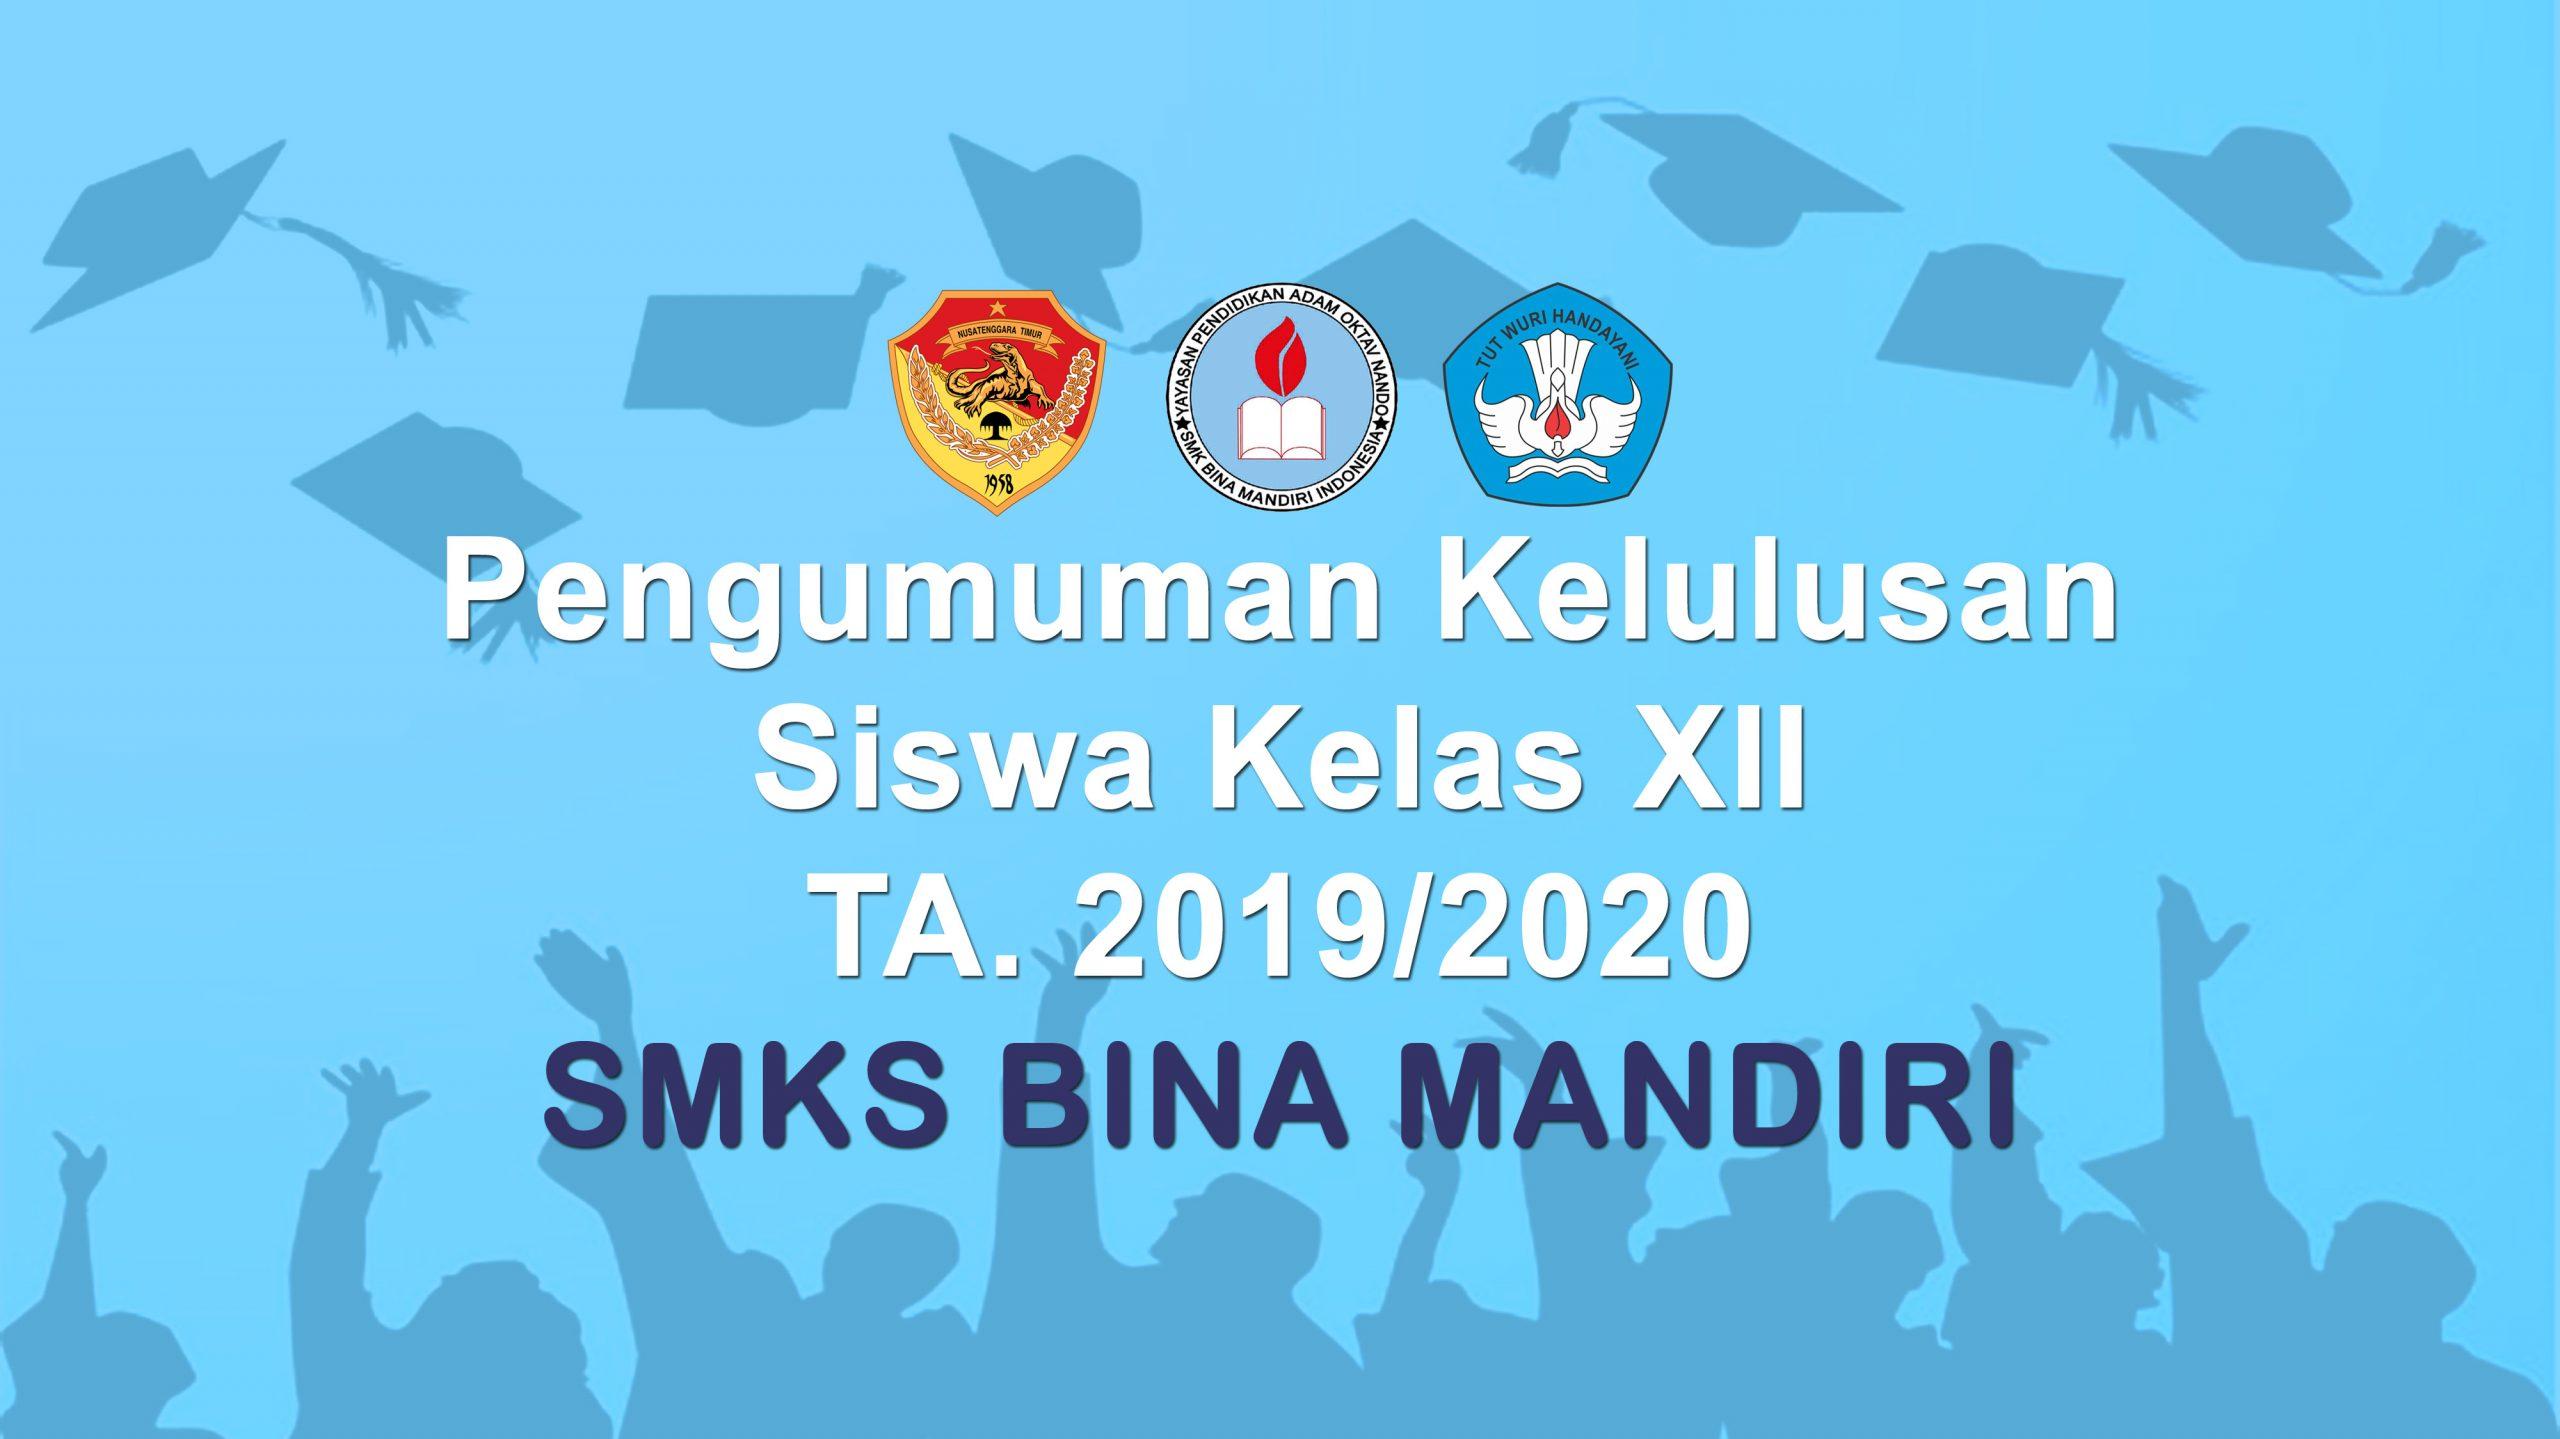 Pengumuman Kelulusan Siswa tahun 2020 SMKS Bina Mandiri